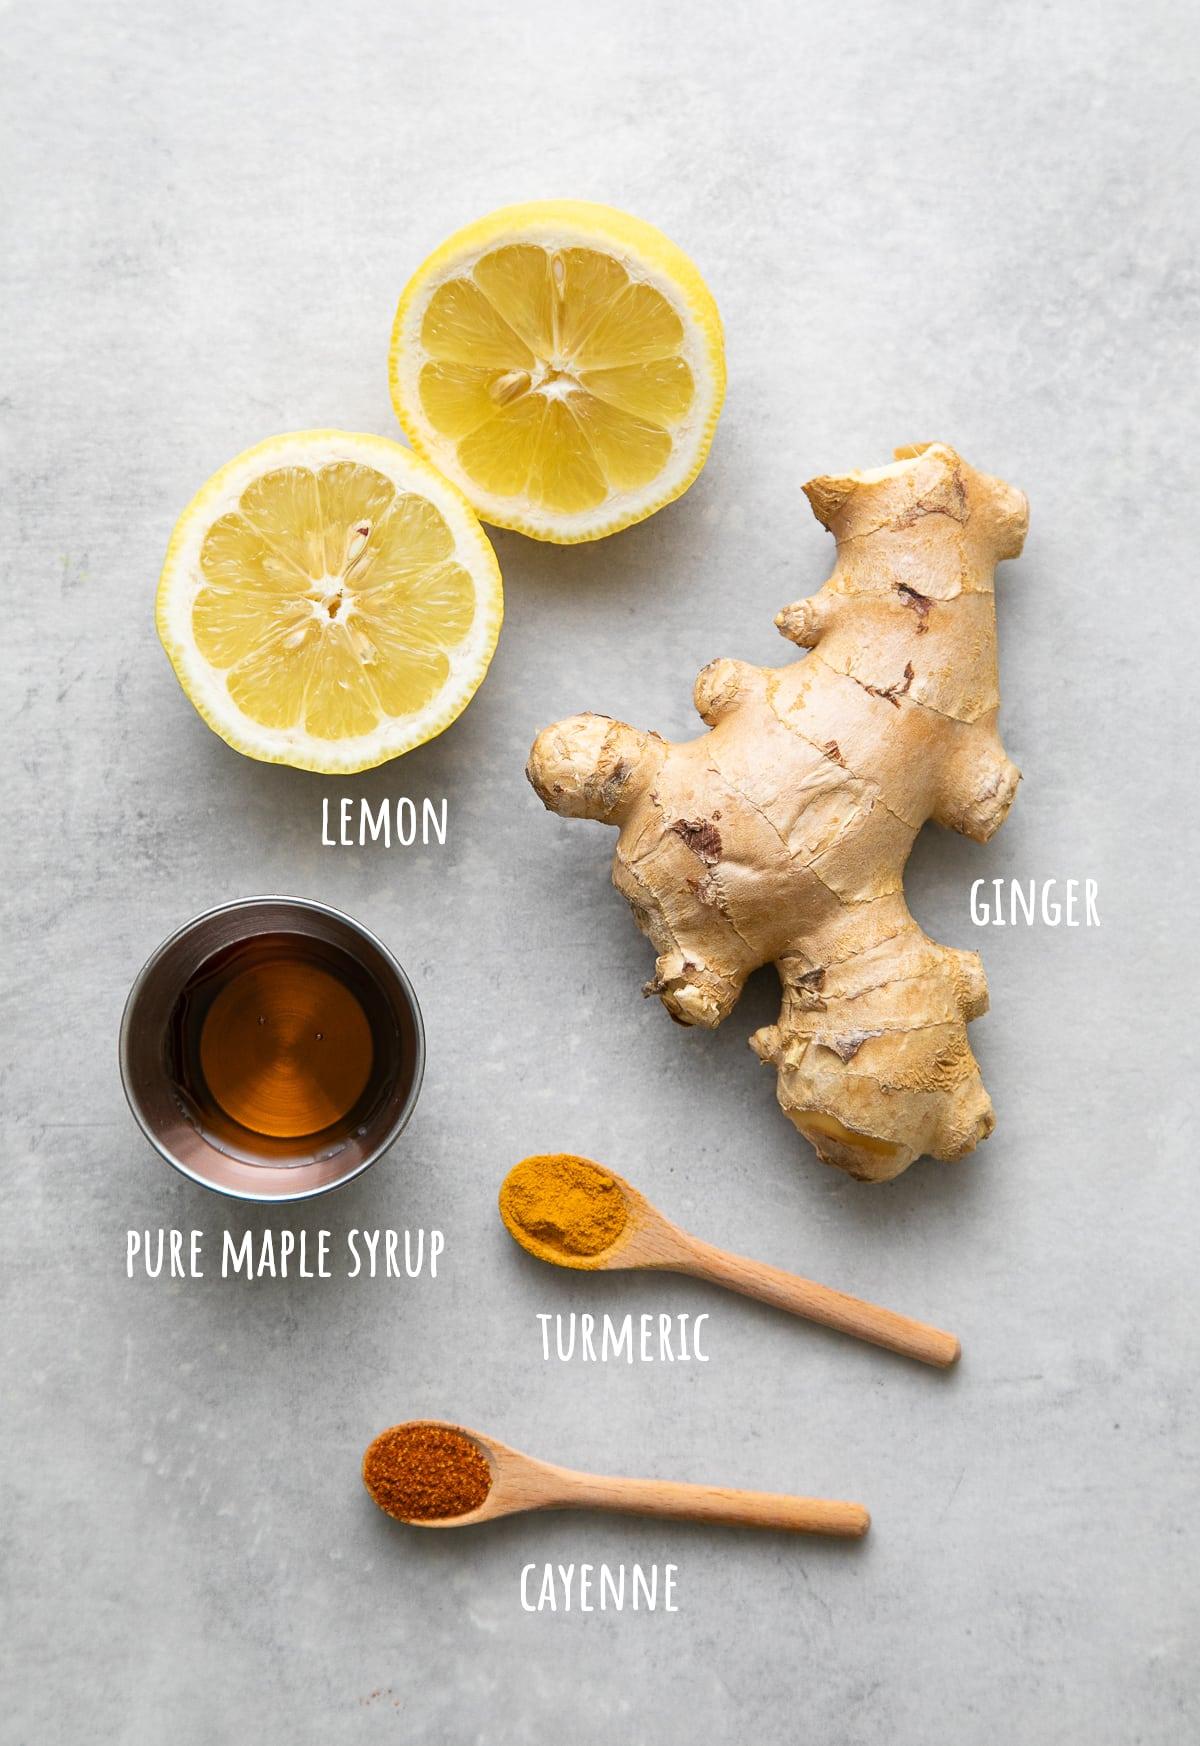 top down view of ingredients used to make lemon ginger detox tea recipe.